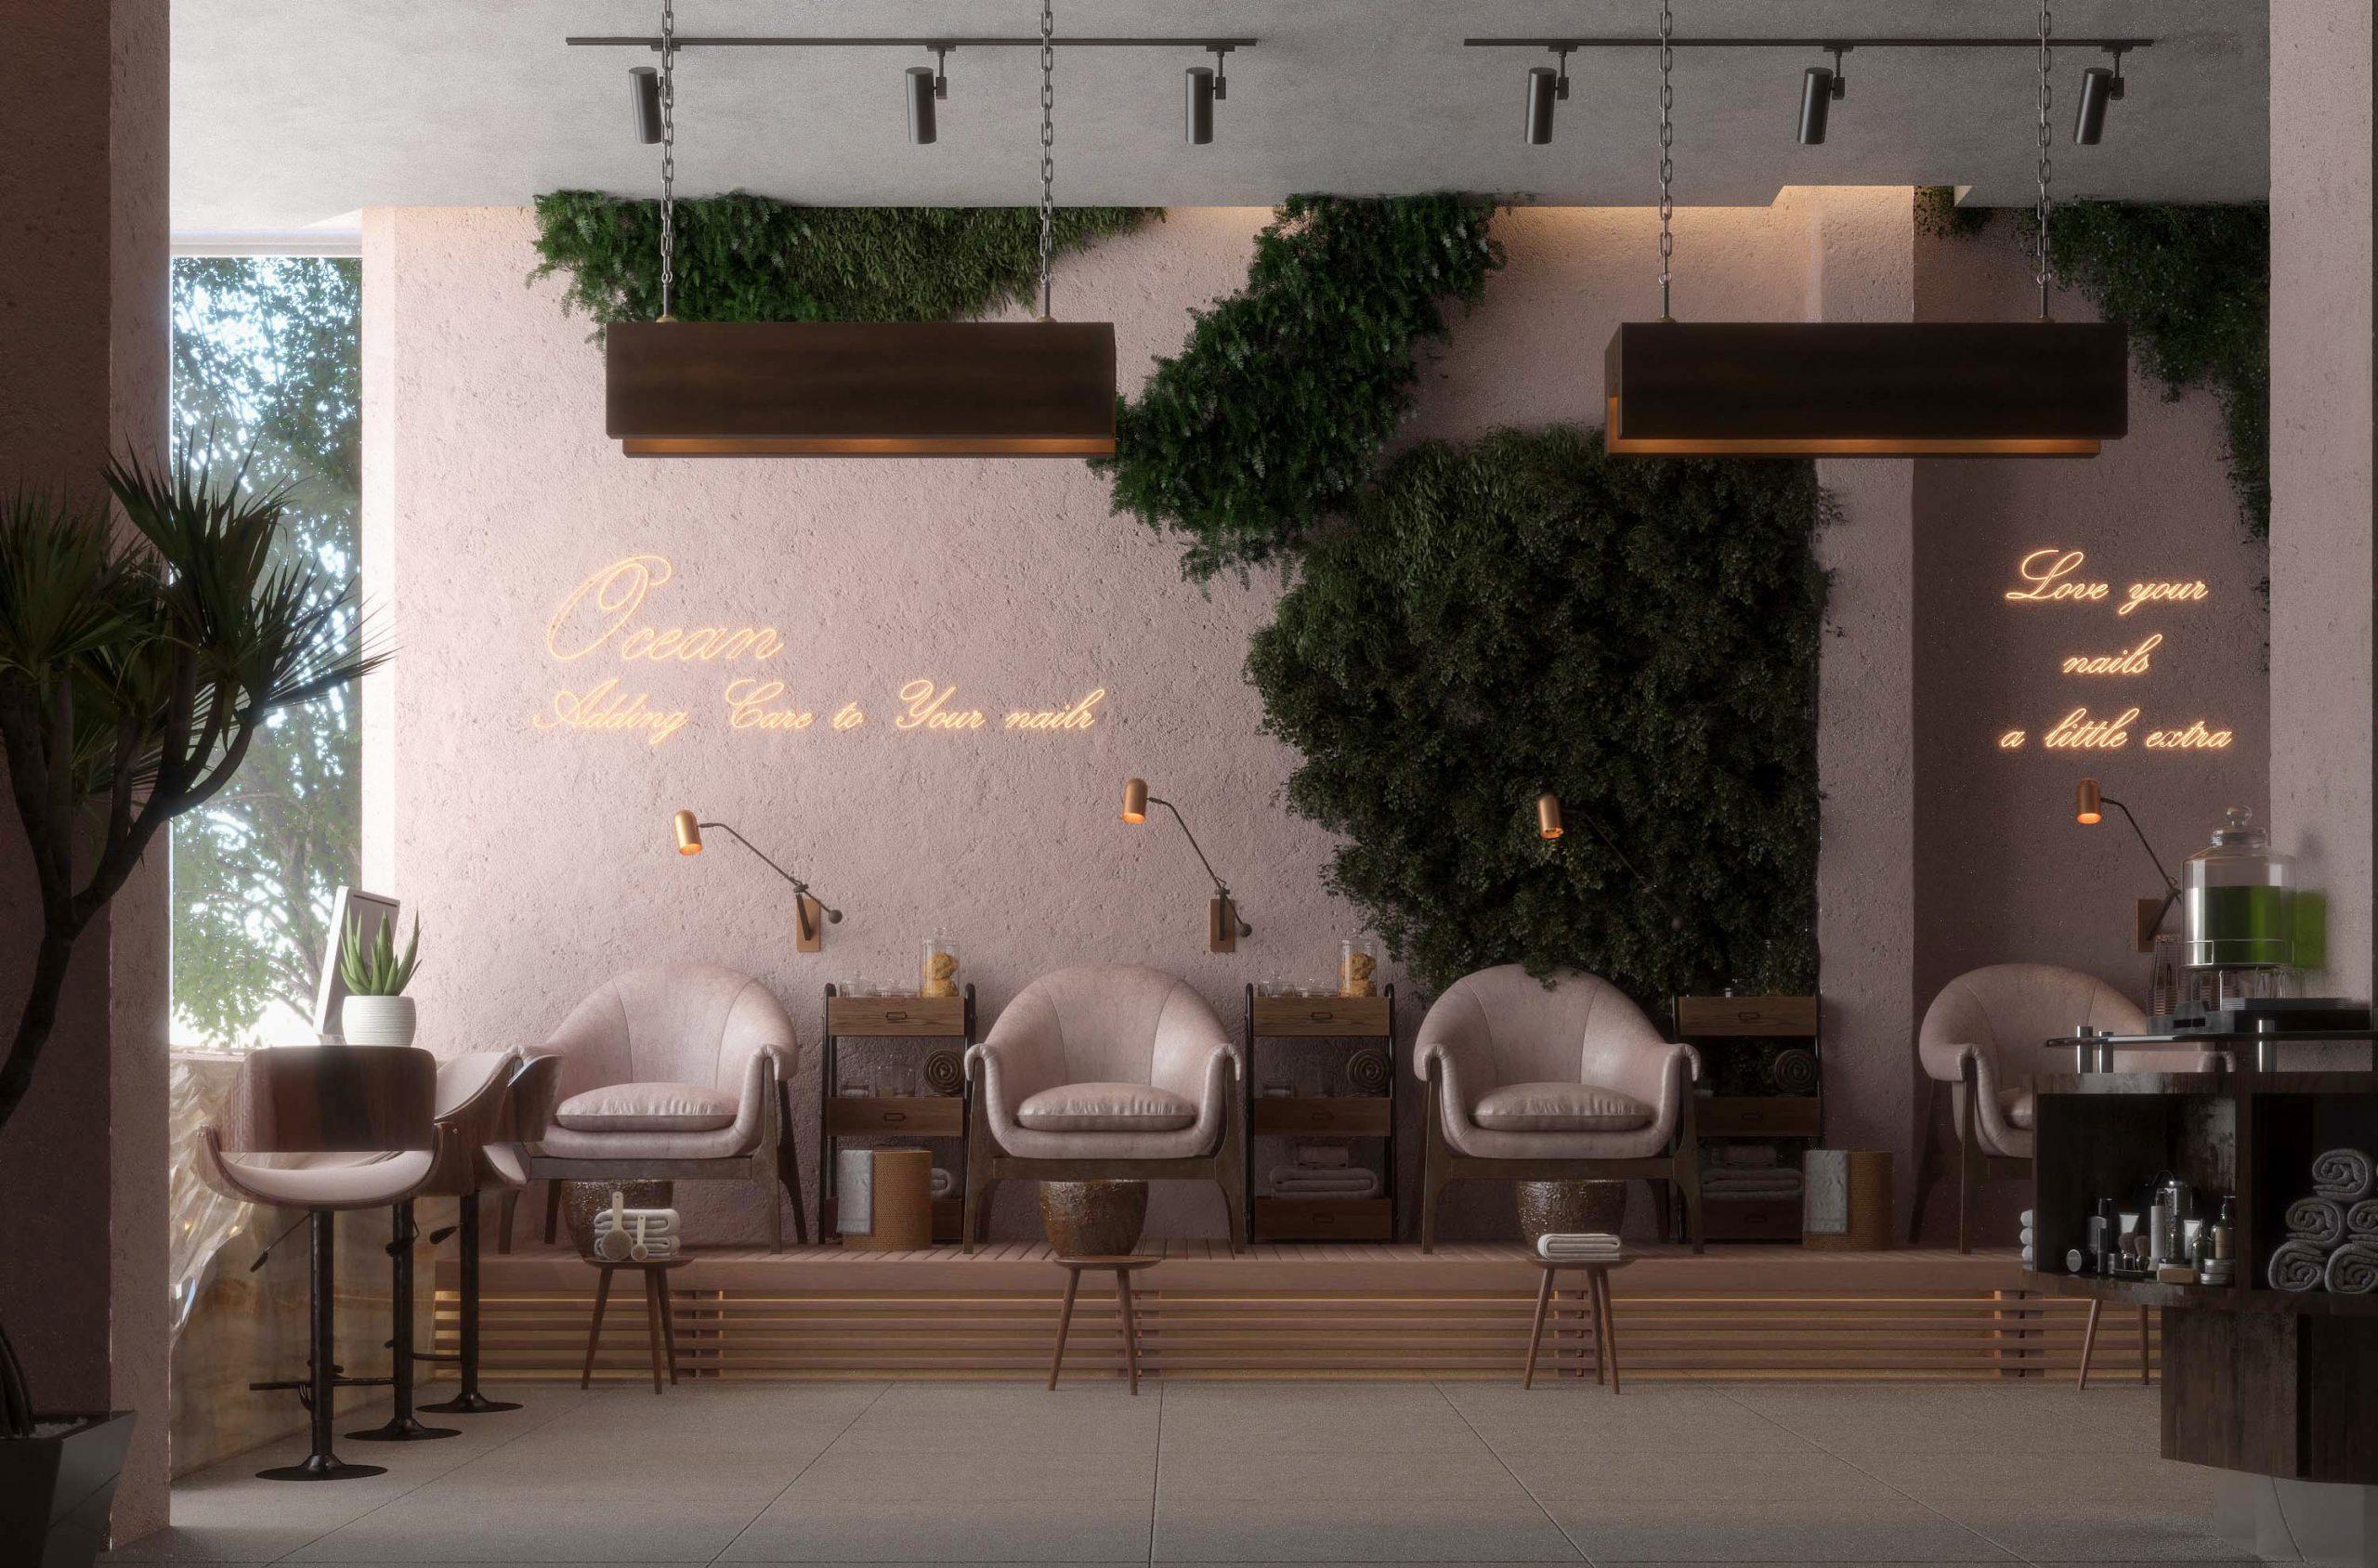 big pic - ocean spa design - plants - spa